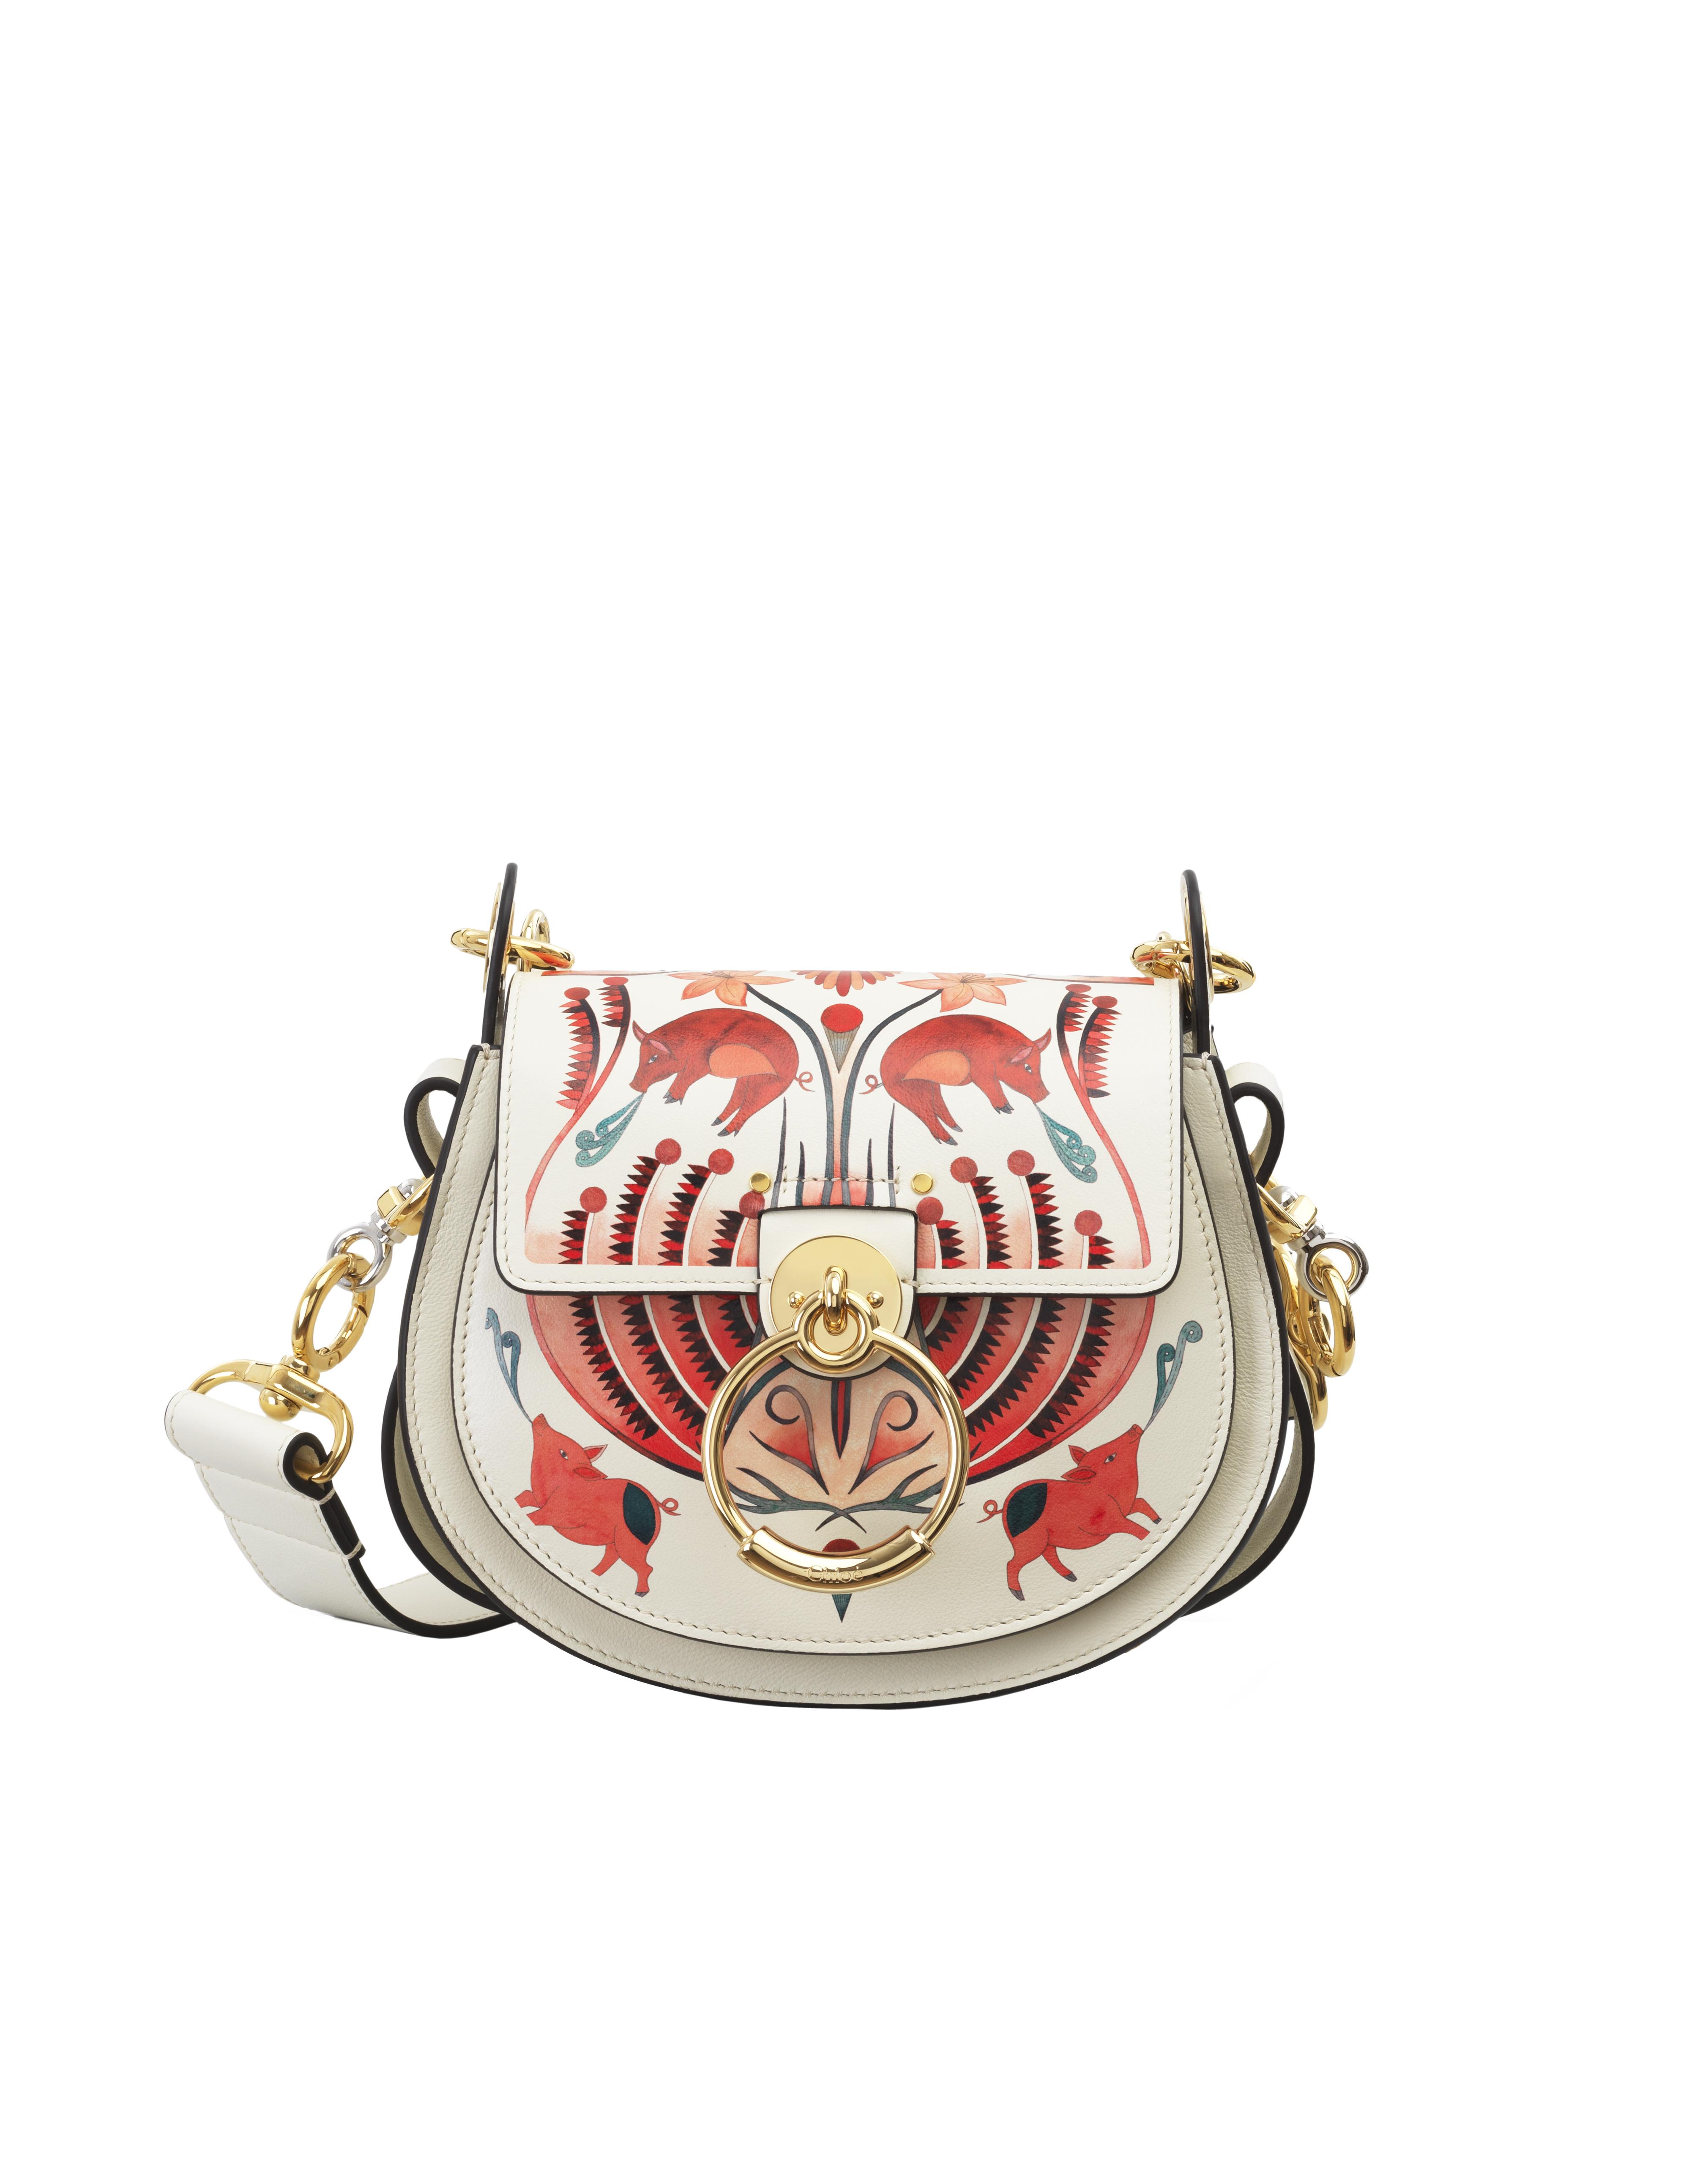 Chloé Small Tess Bag, $3,010